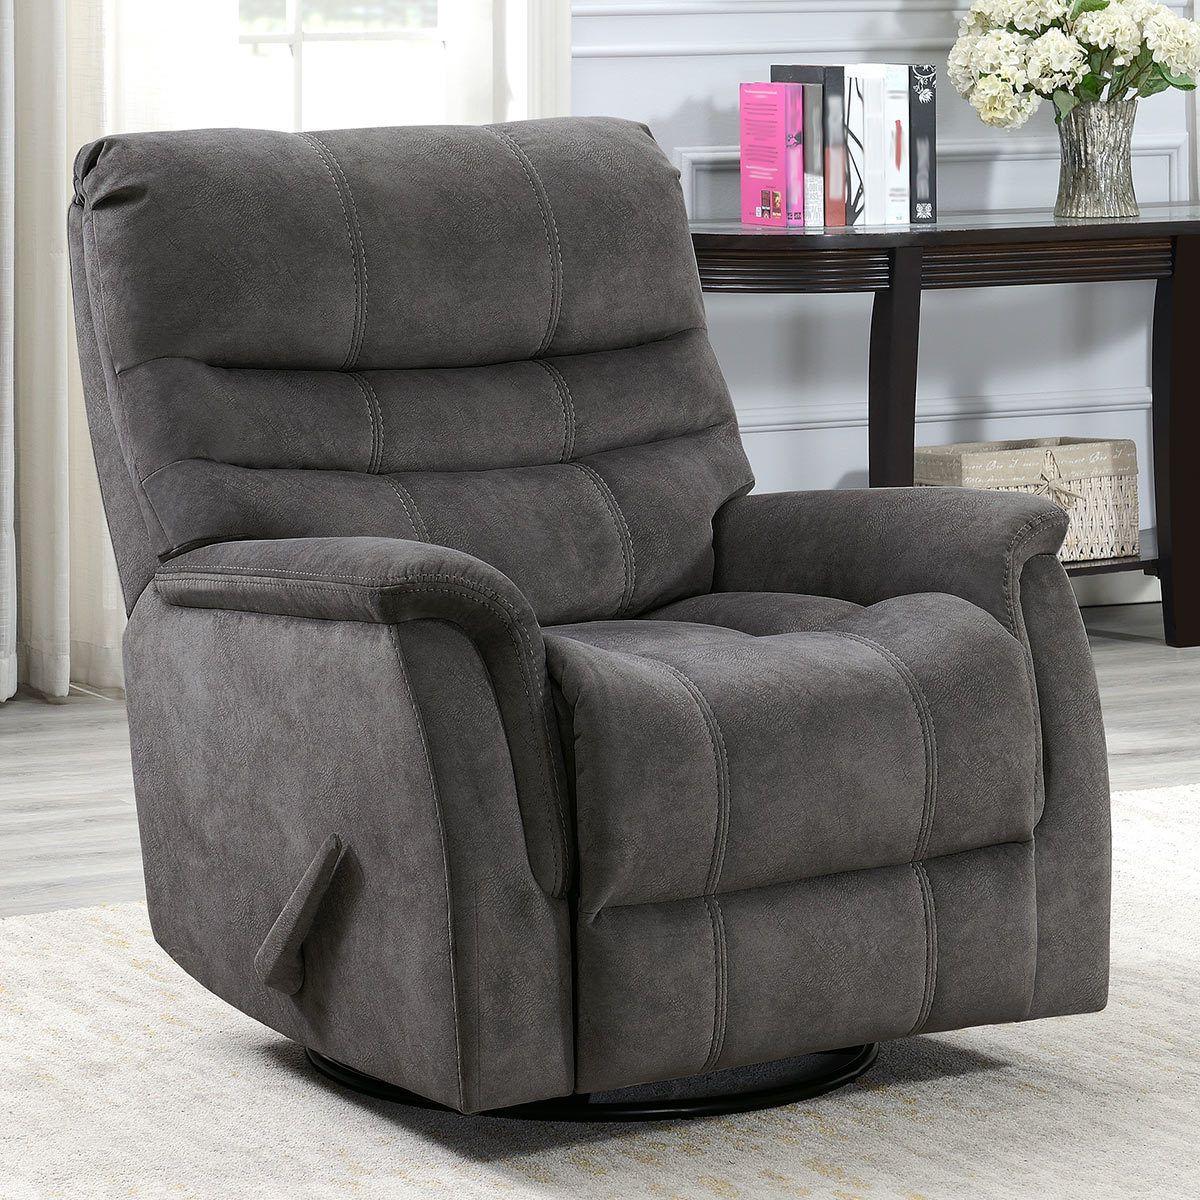 Thomasville Felix Grey Fabric Swivel Glider Recliner Chair